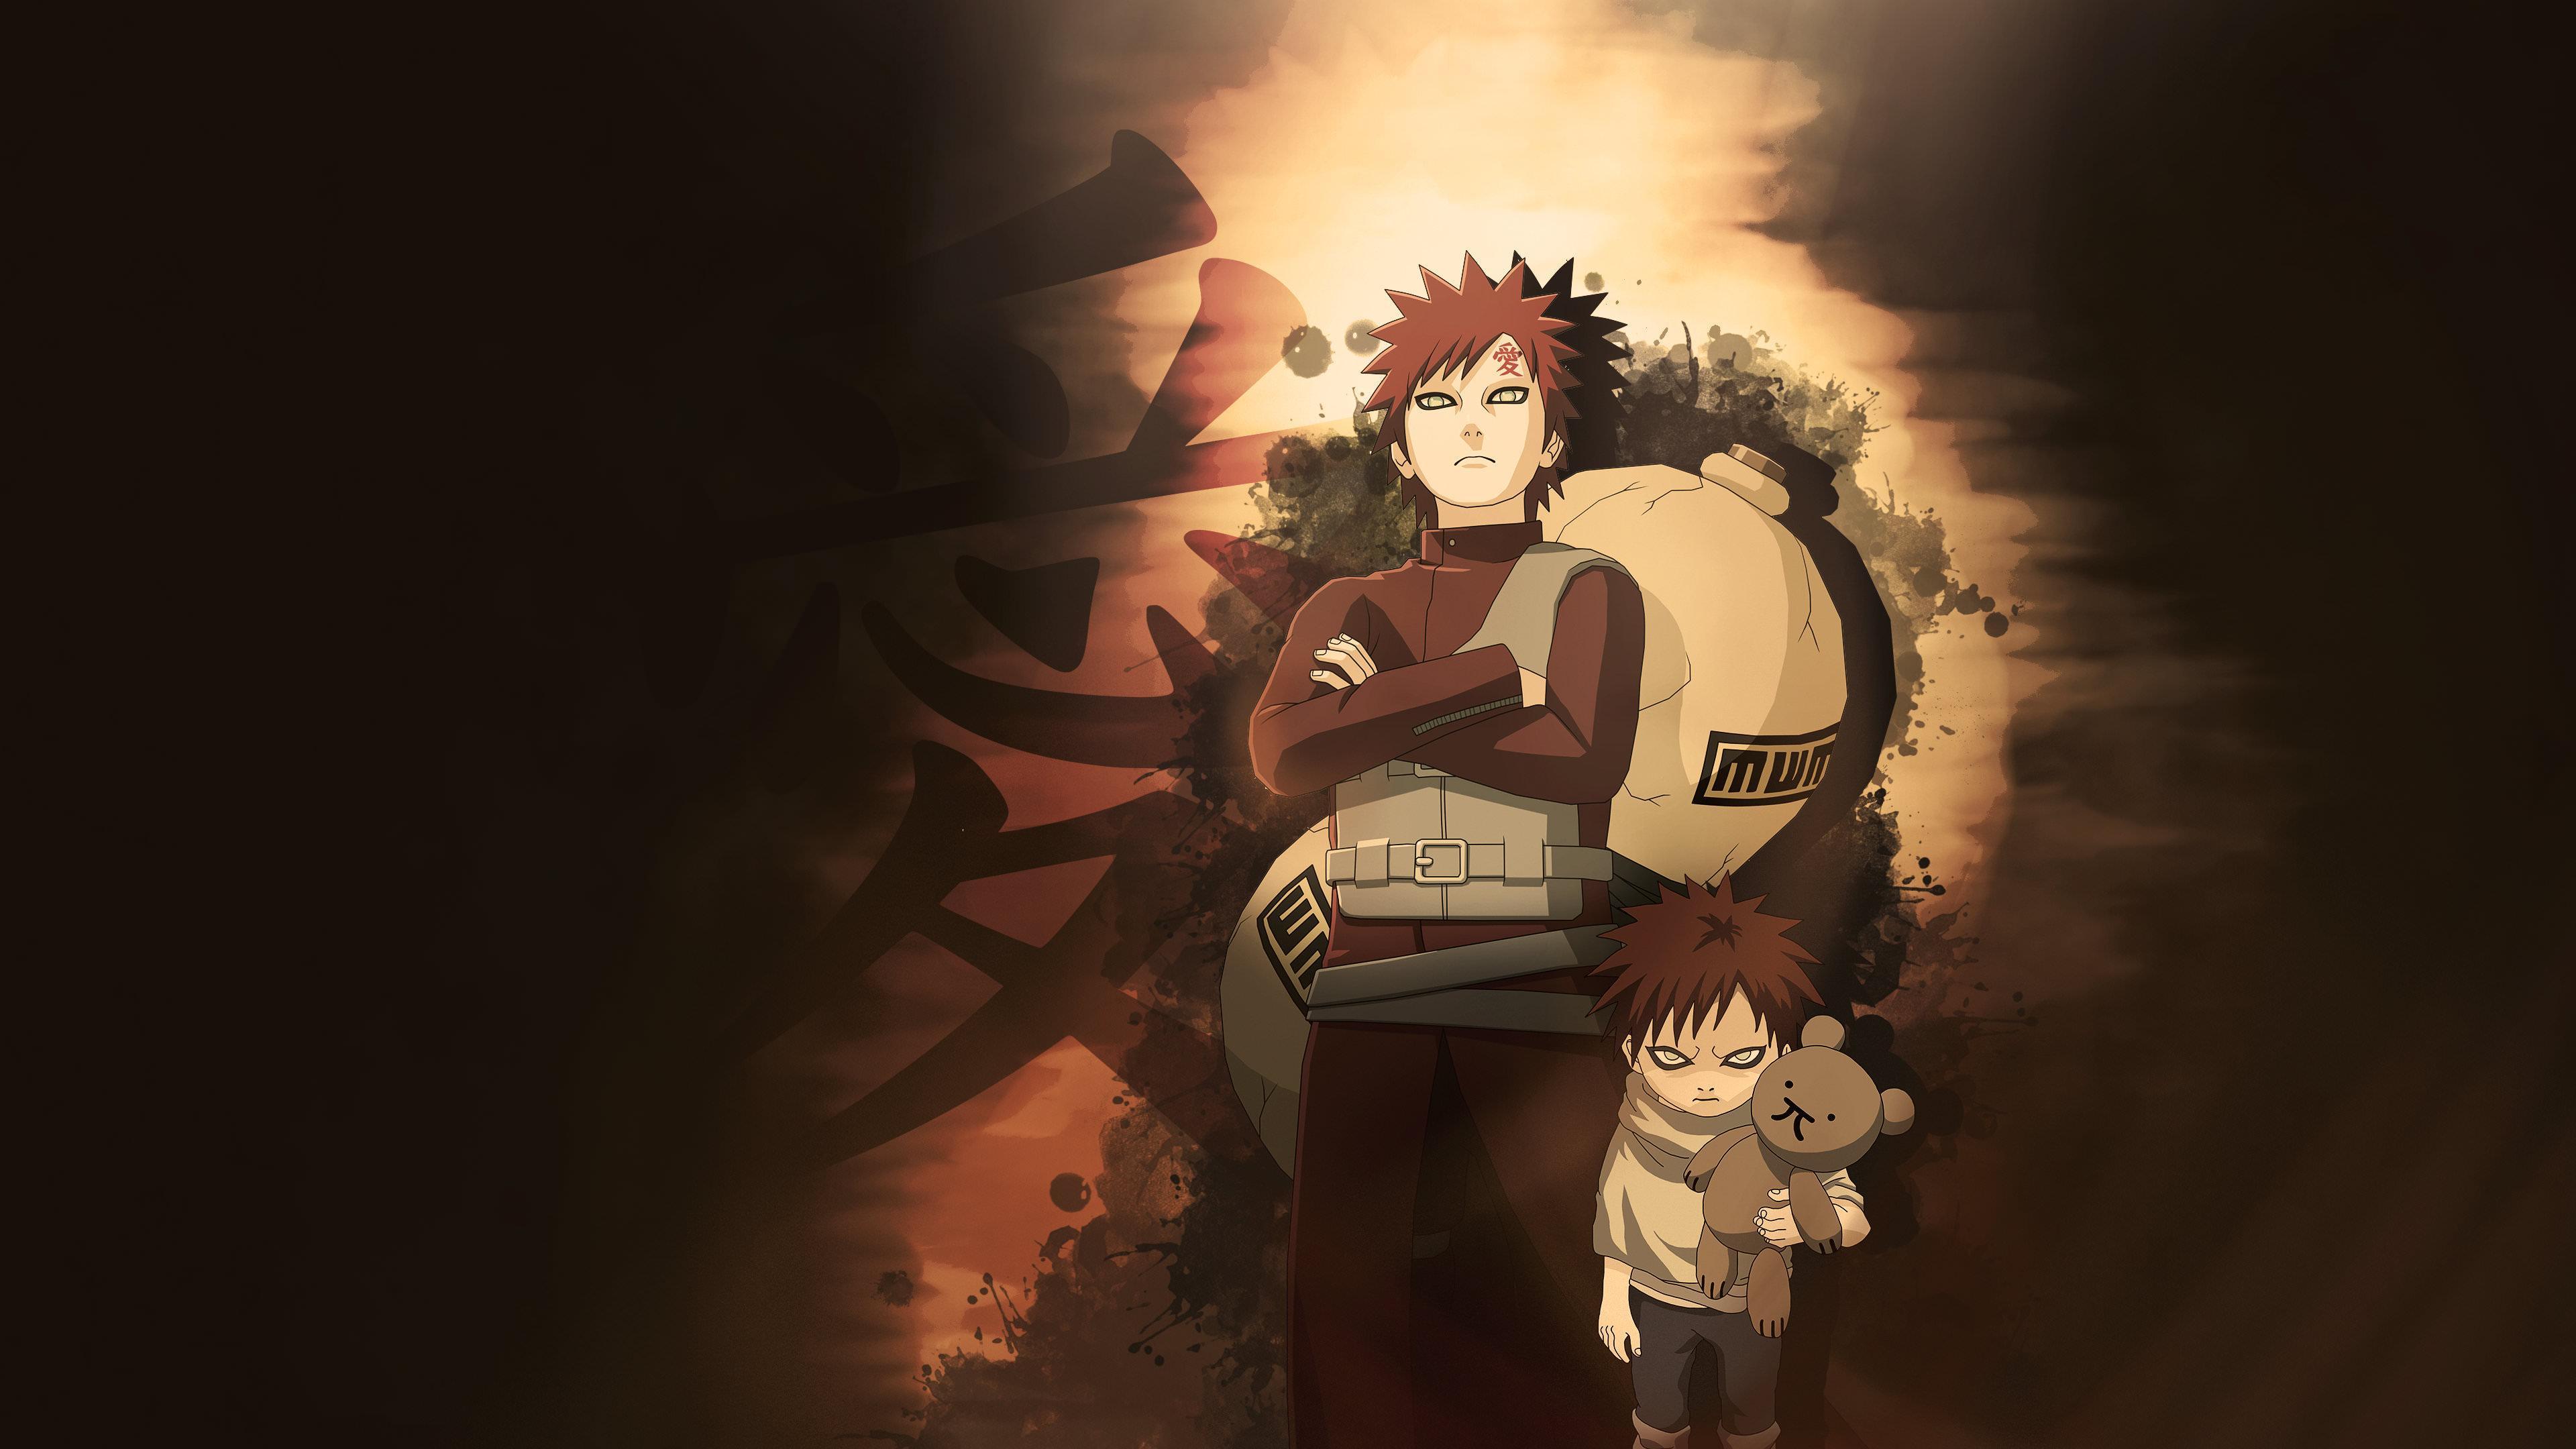 Unduh 610 Koleksi Wallpaper Naruto Hd Pc HD Terbaik